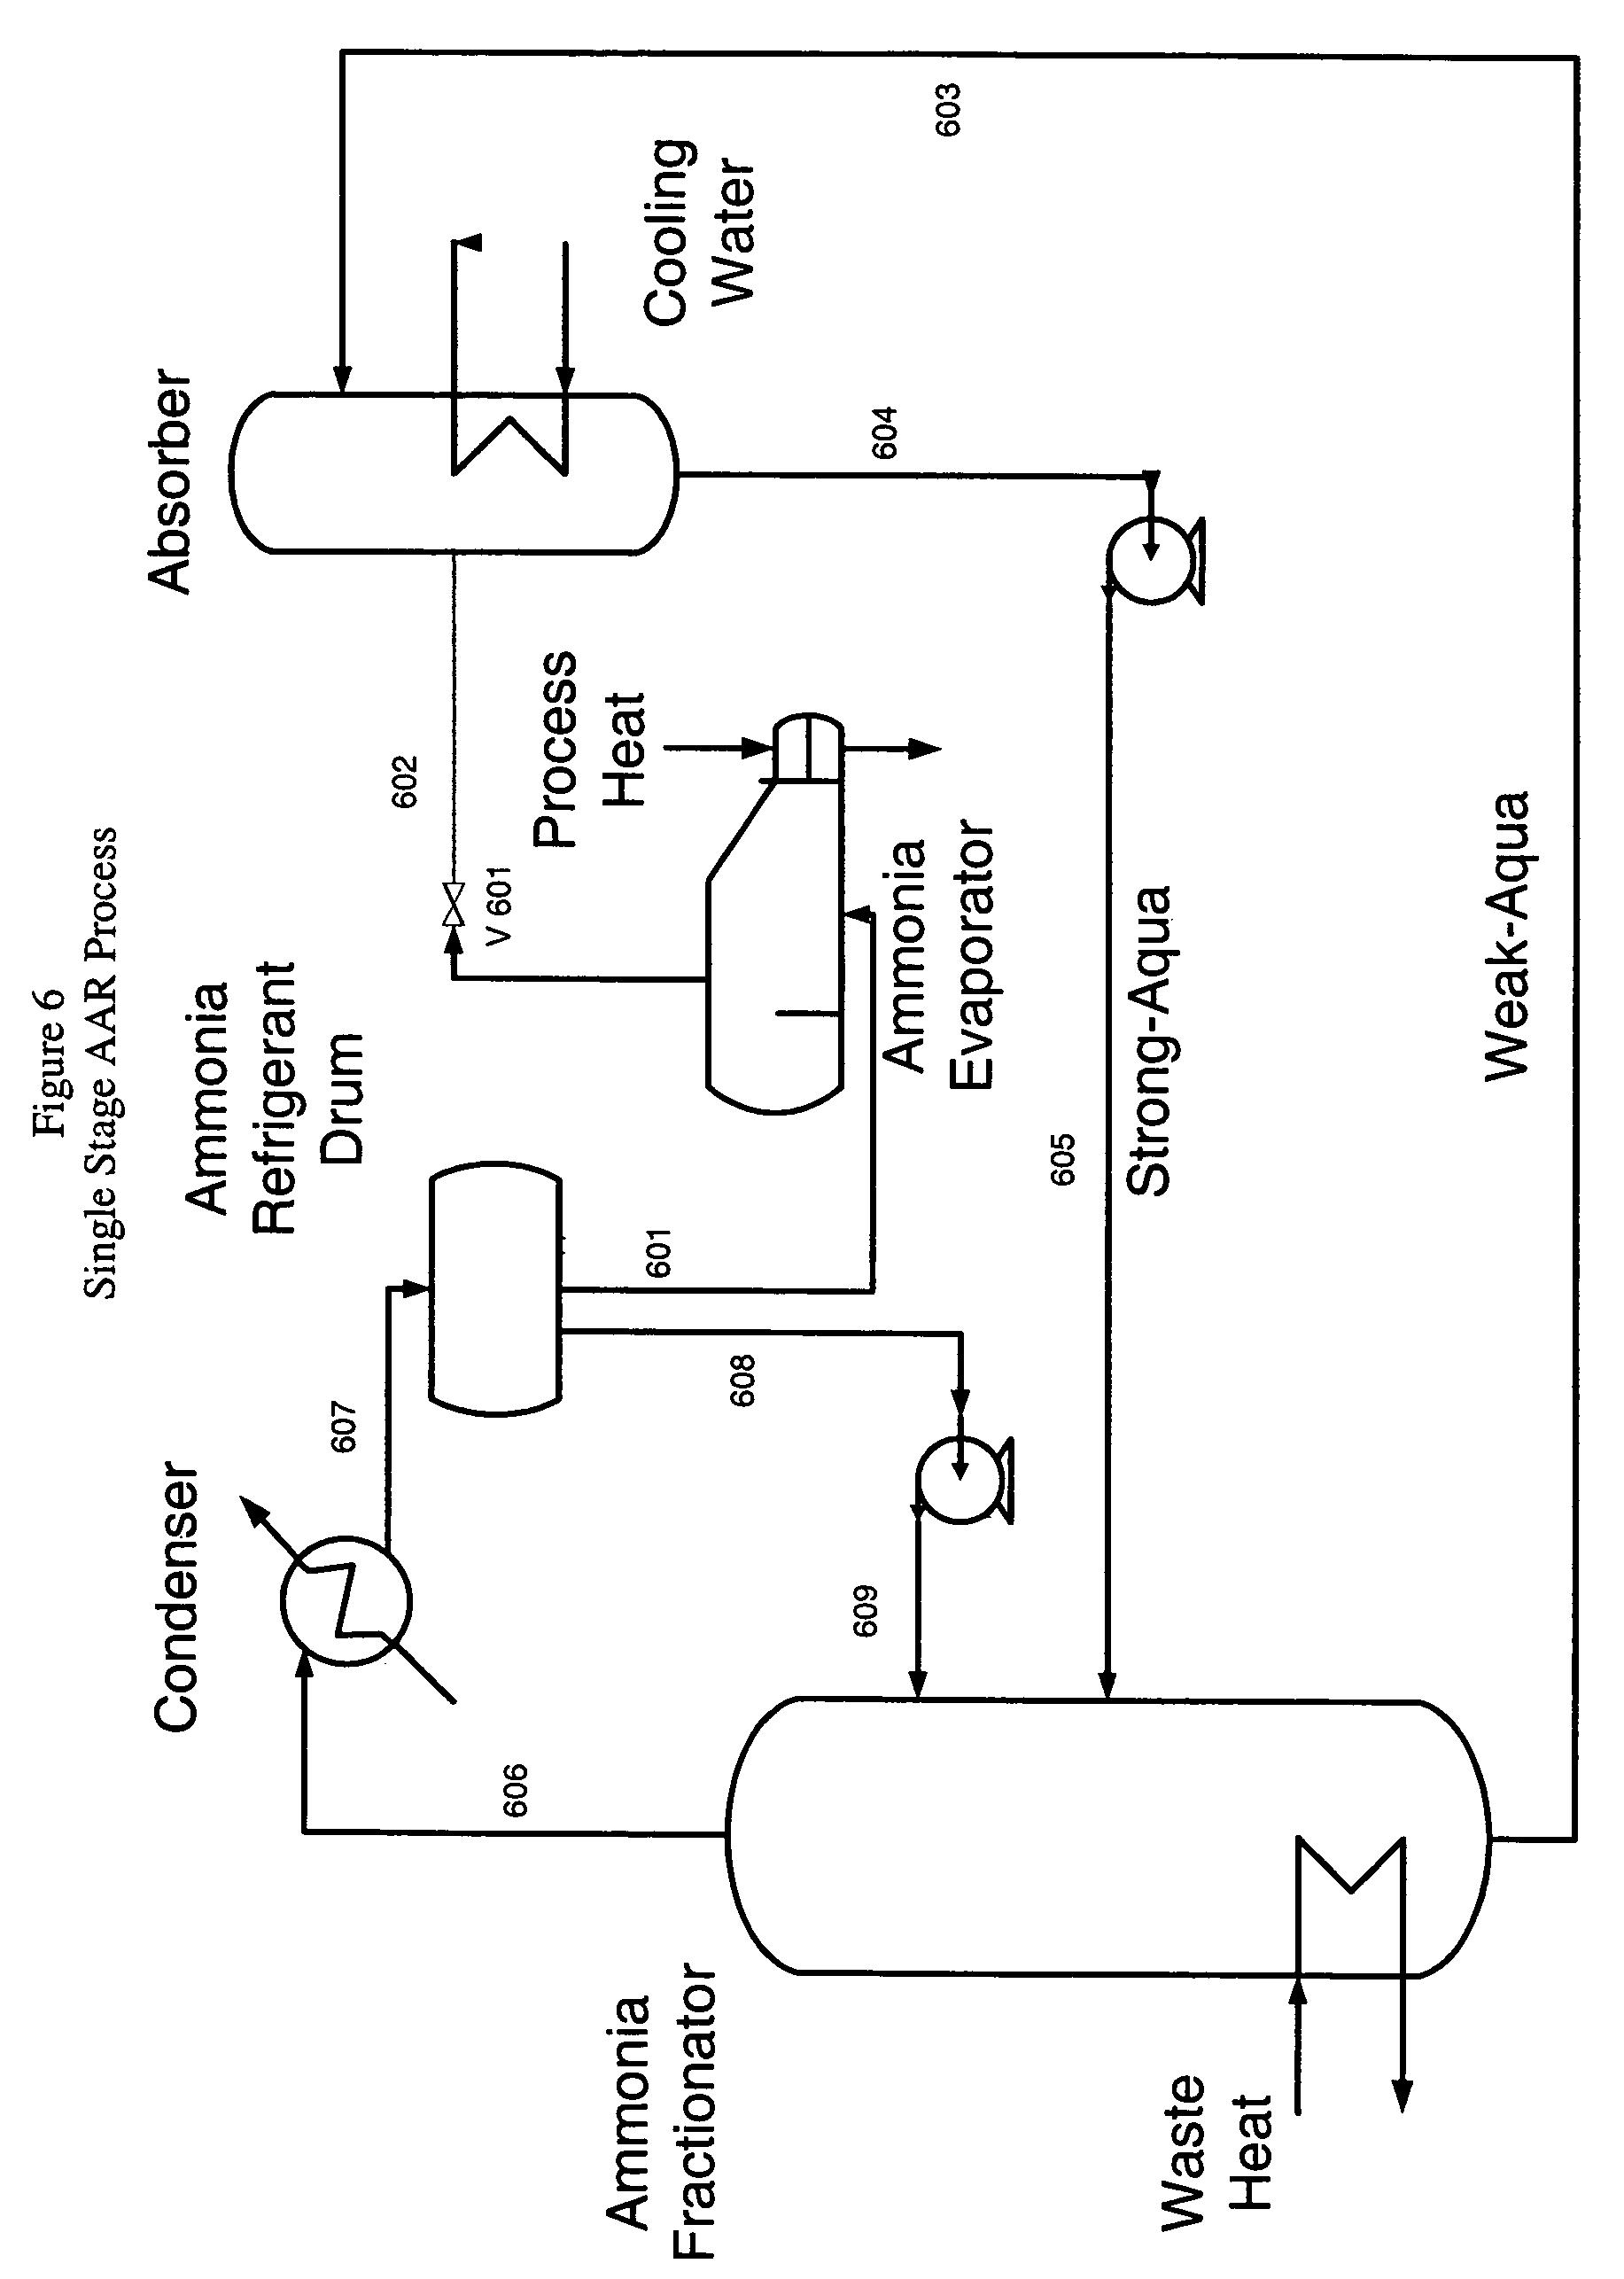 isuzu rodeo wiring diagram troubleshooting images diagram wiring diagrams pictures wiring diagrams